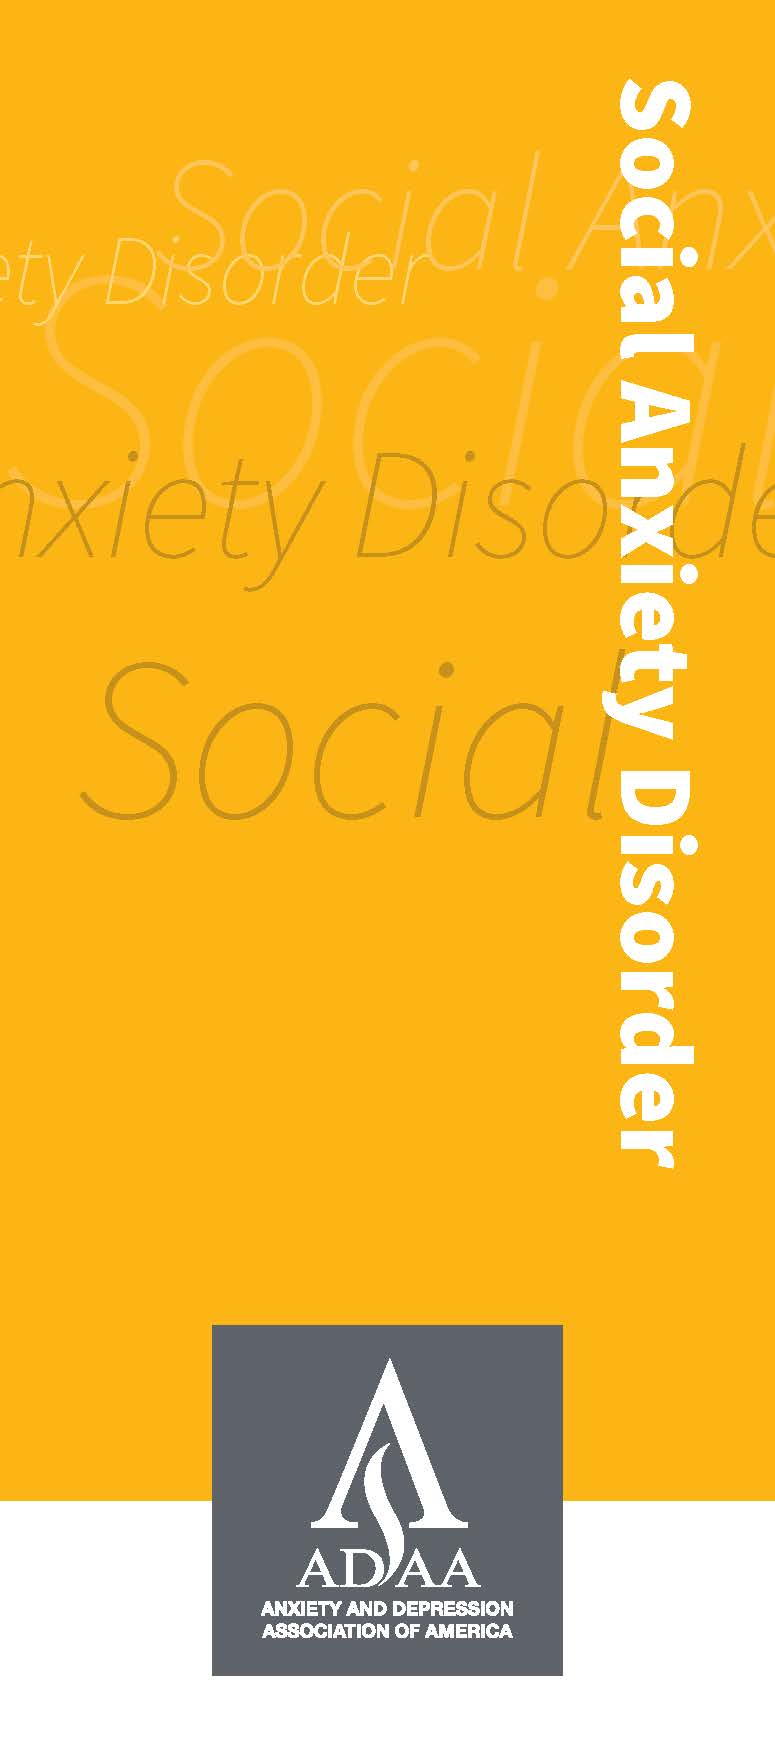 Thumbnail: ADAA Social Anxiety Disorxer Brochure